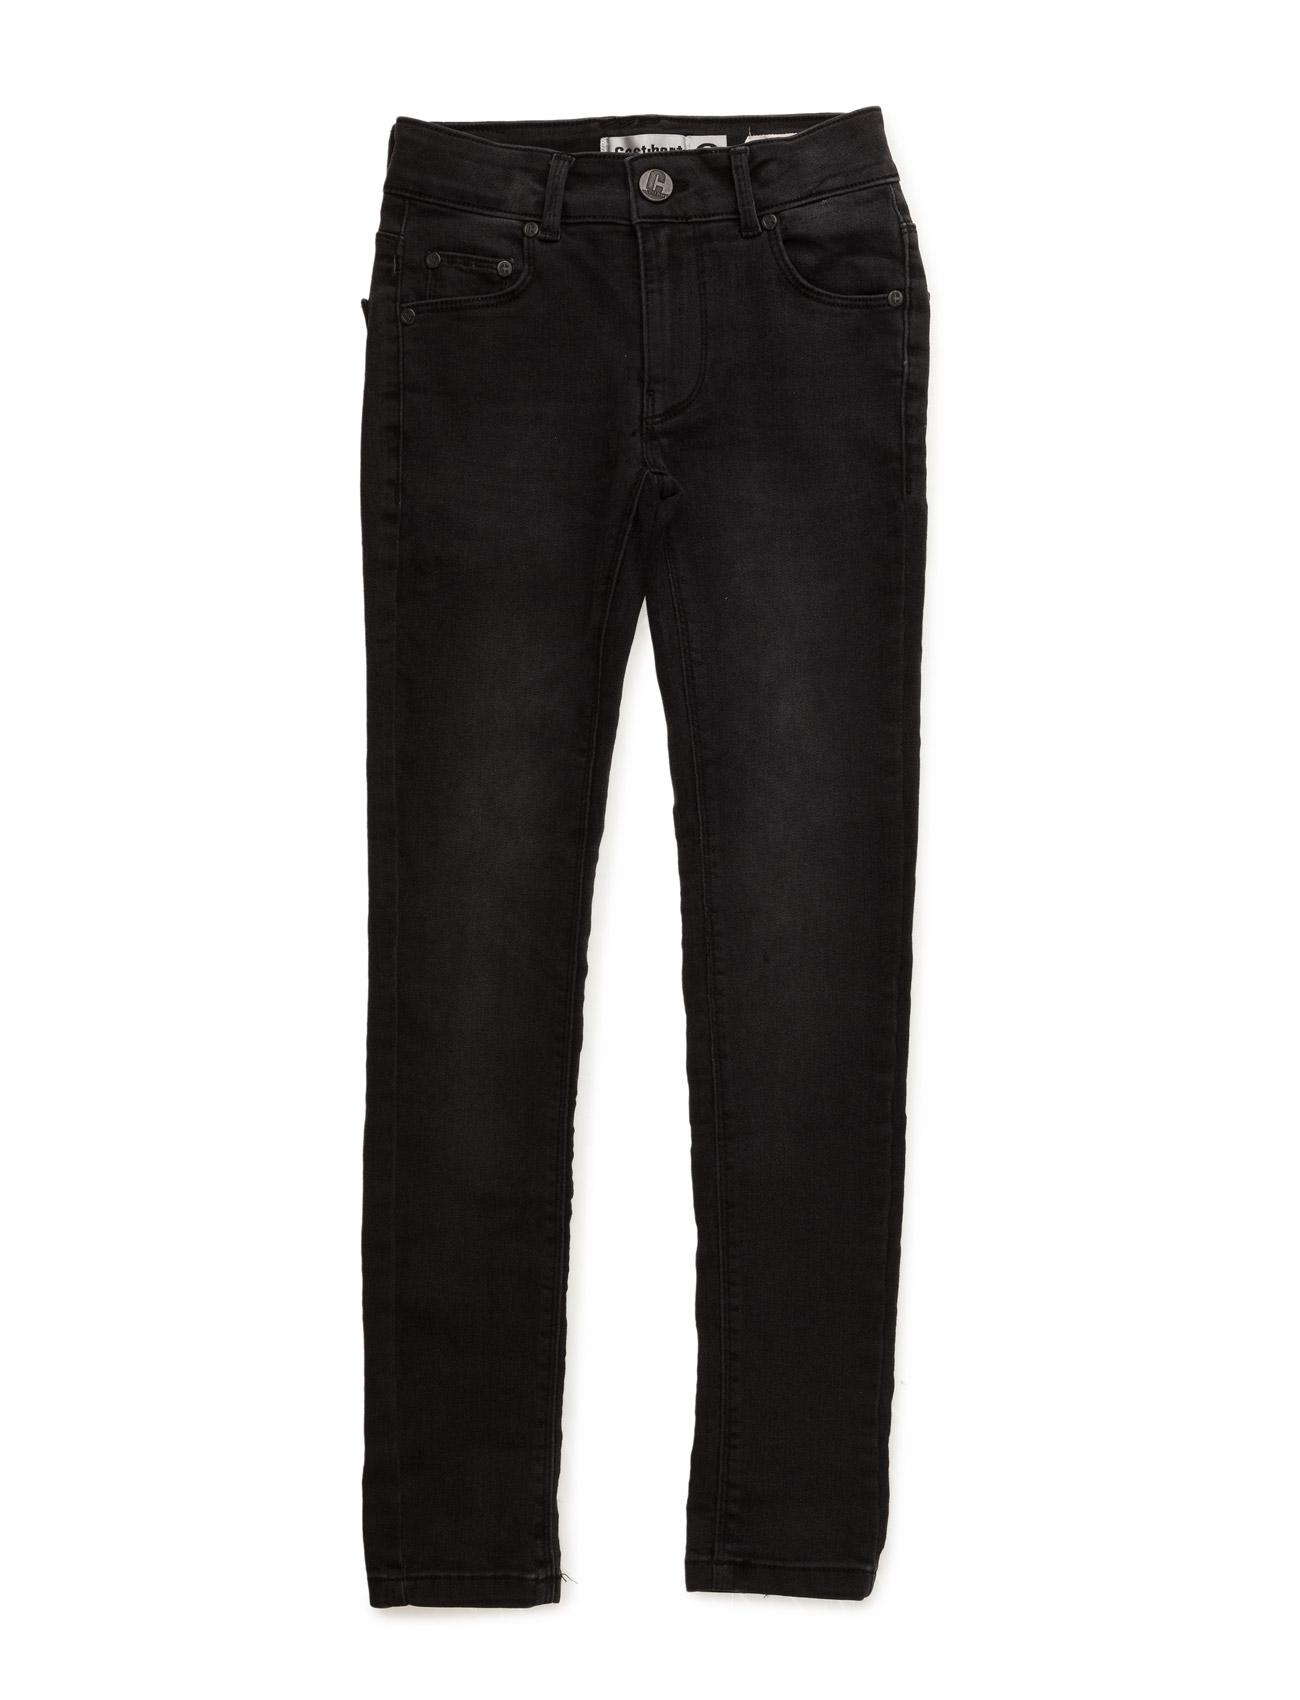 1eaa186d7df Bowie Jeans (966-dark Grey Denim) (£34.27) - CostBart - | Boozt.com